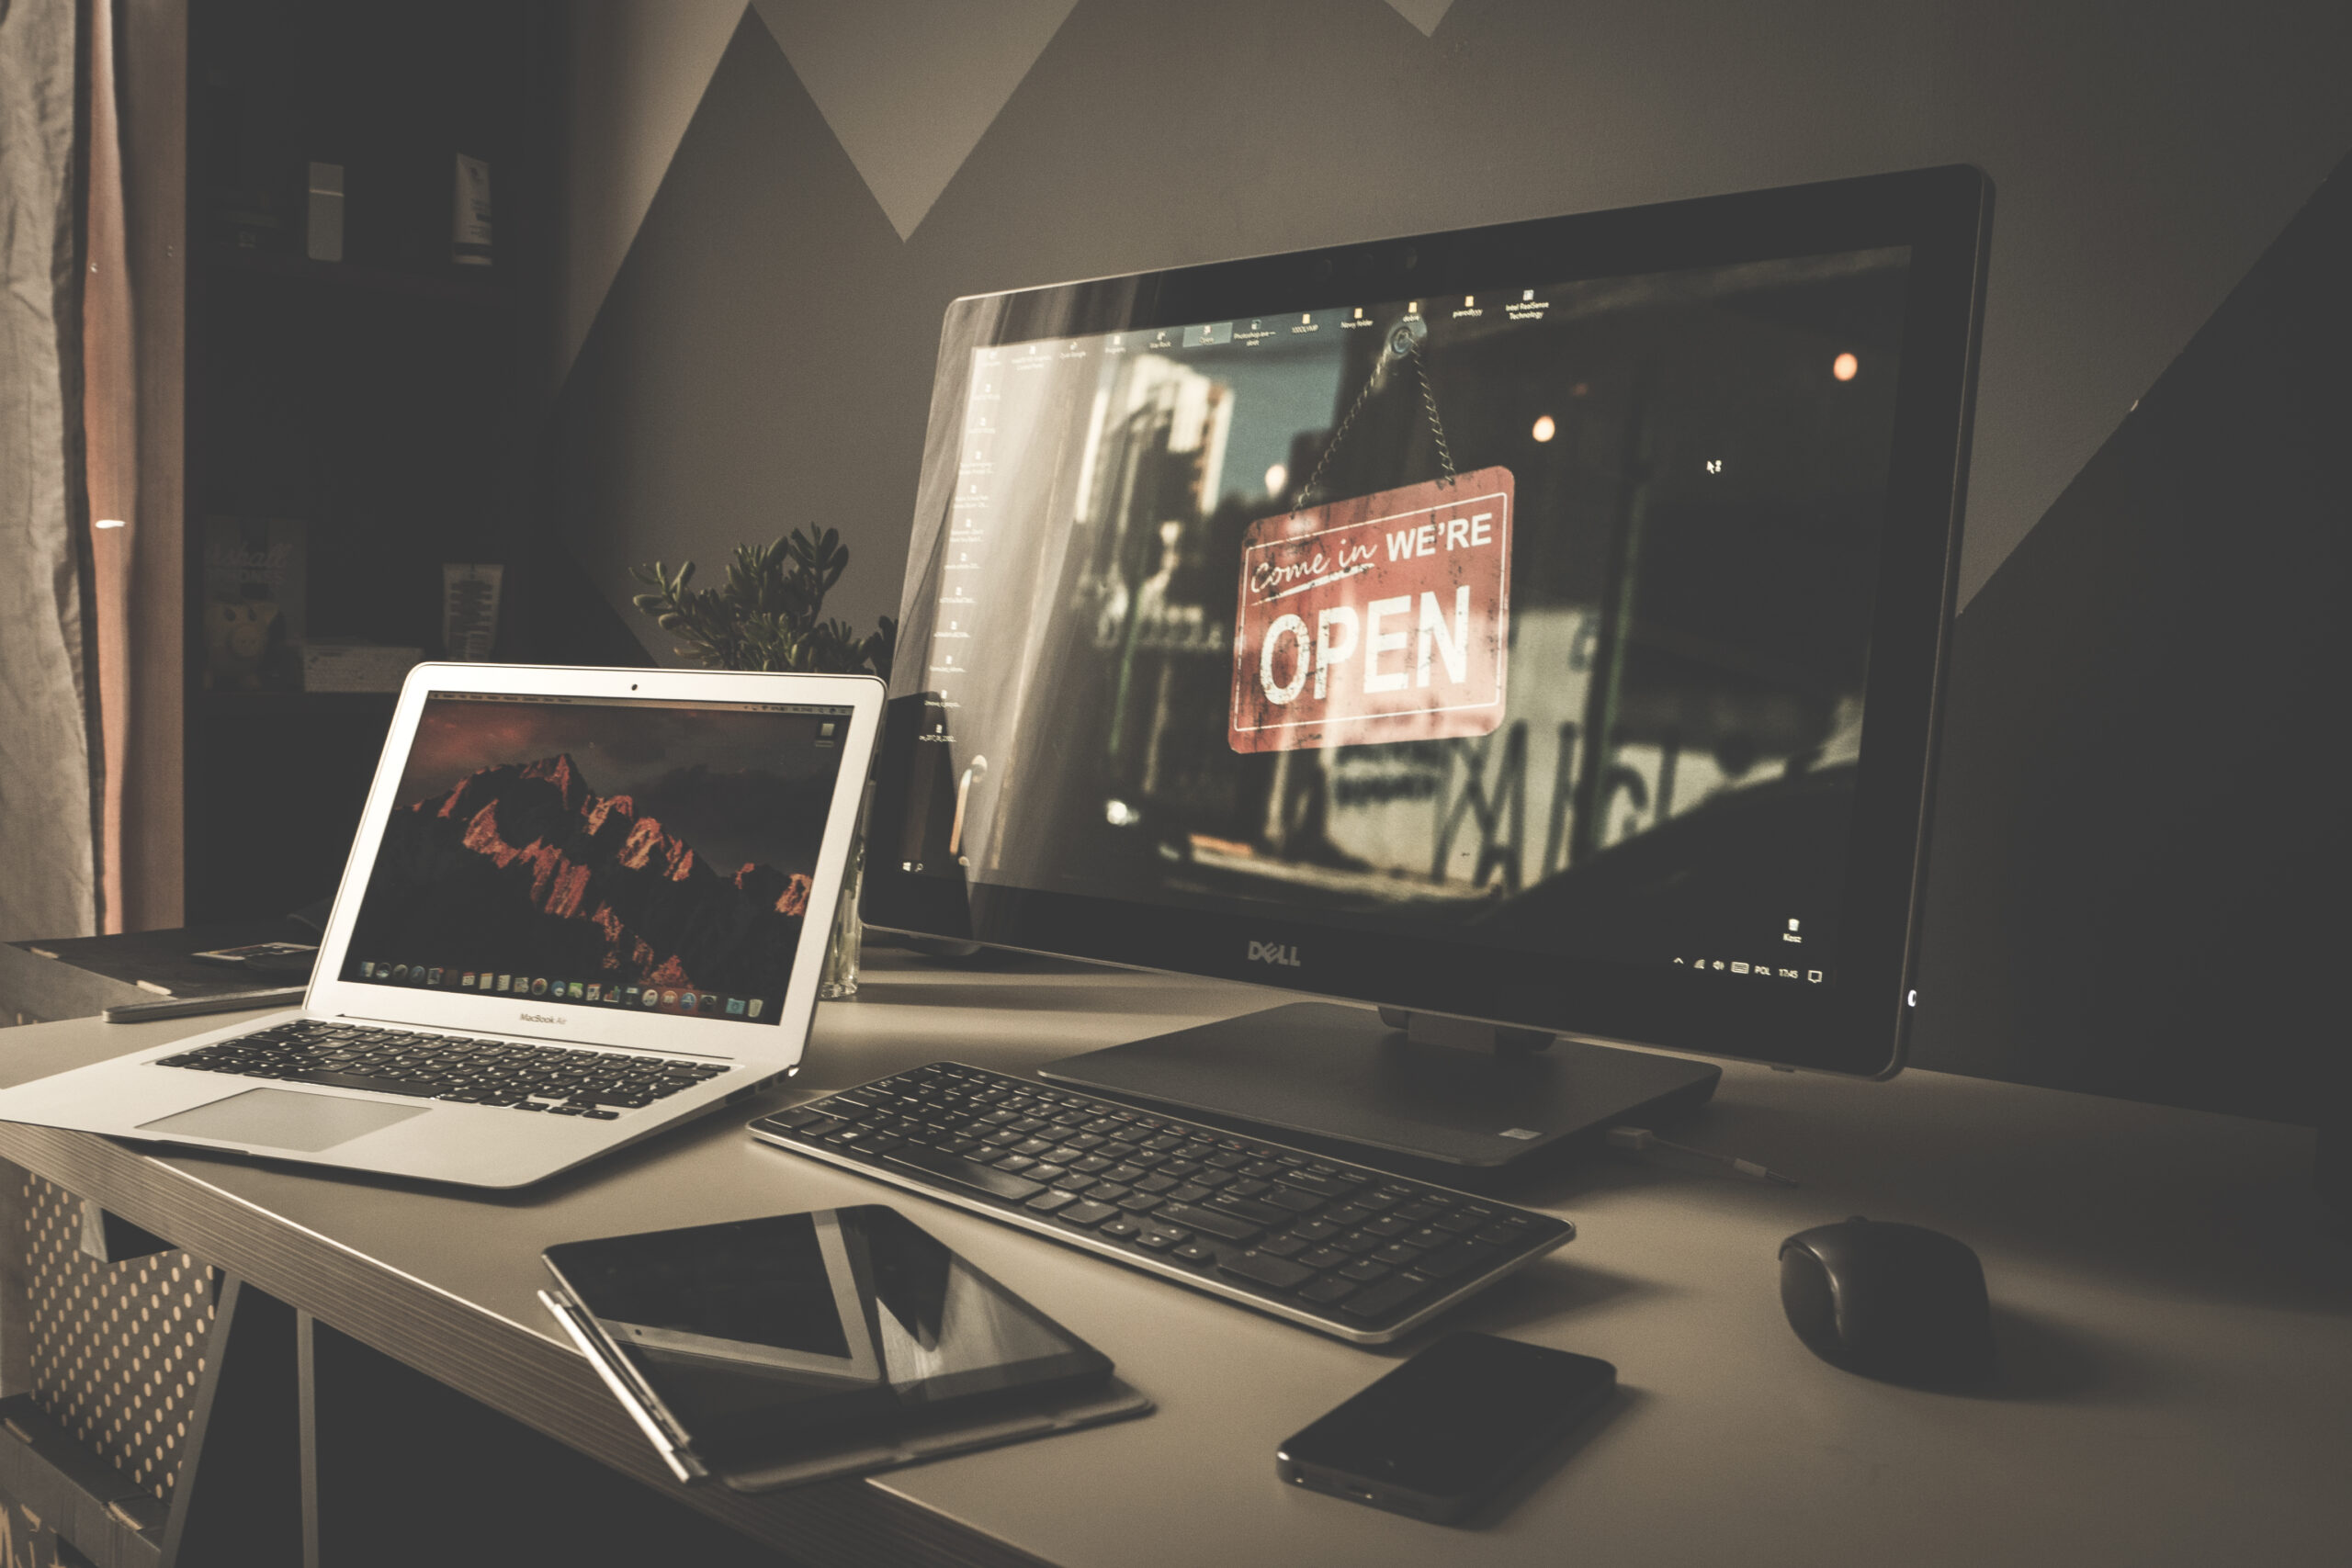 ChicDivaGeek-Laptop-Computer-iPad-iPhone